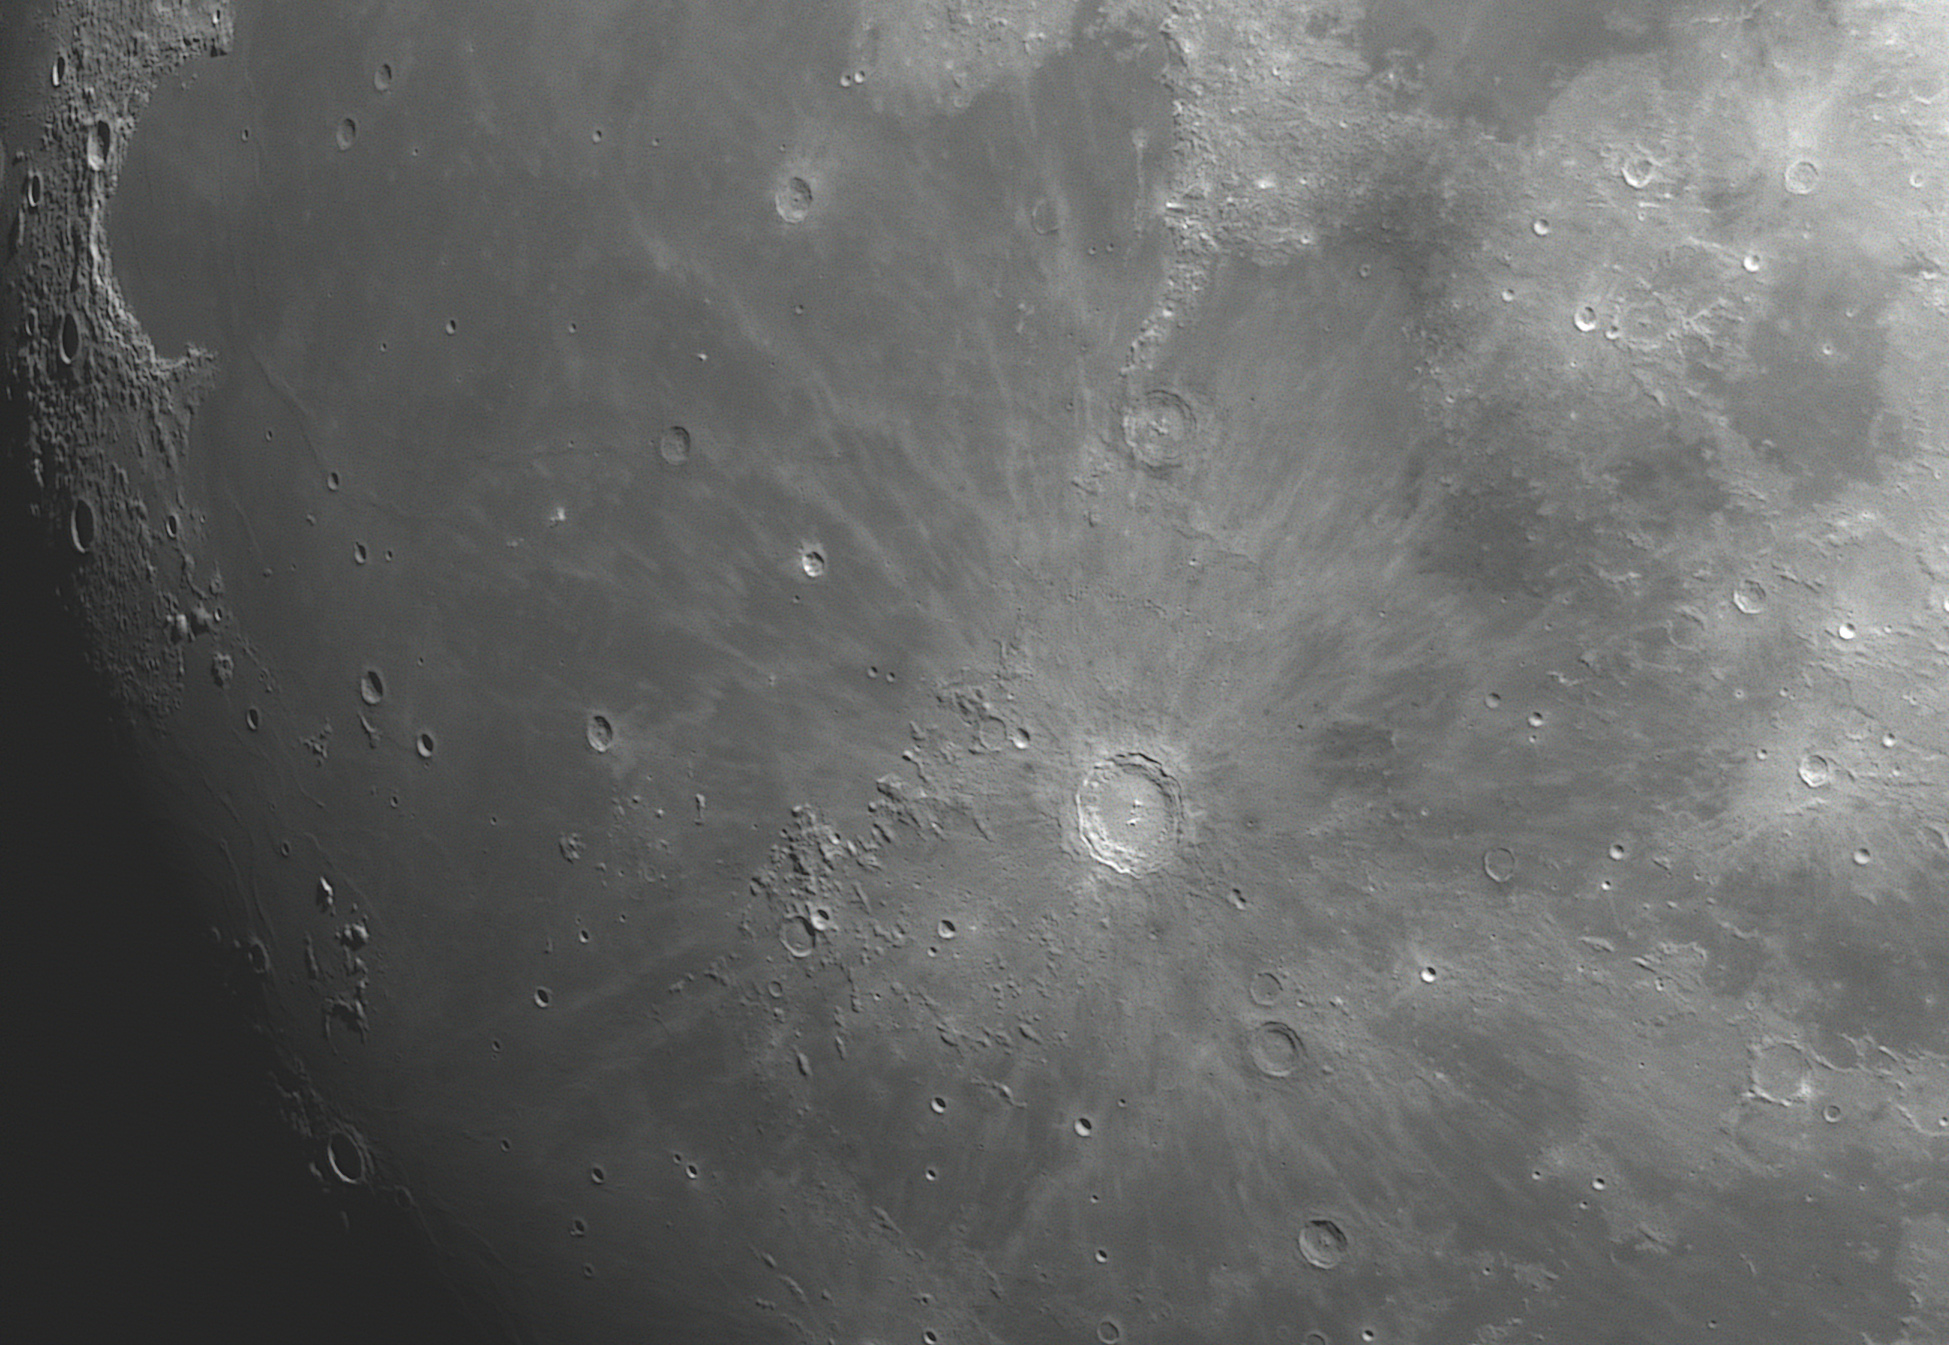 5ce01419da9af_Coperniceninfra-rouge.jpg.65b673c18ec3fd0cbea5f17567ebd1c0.jpg